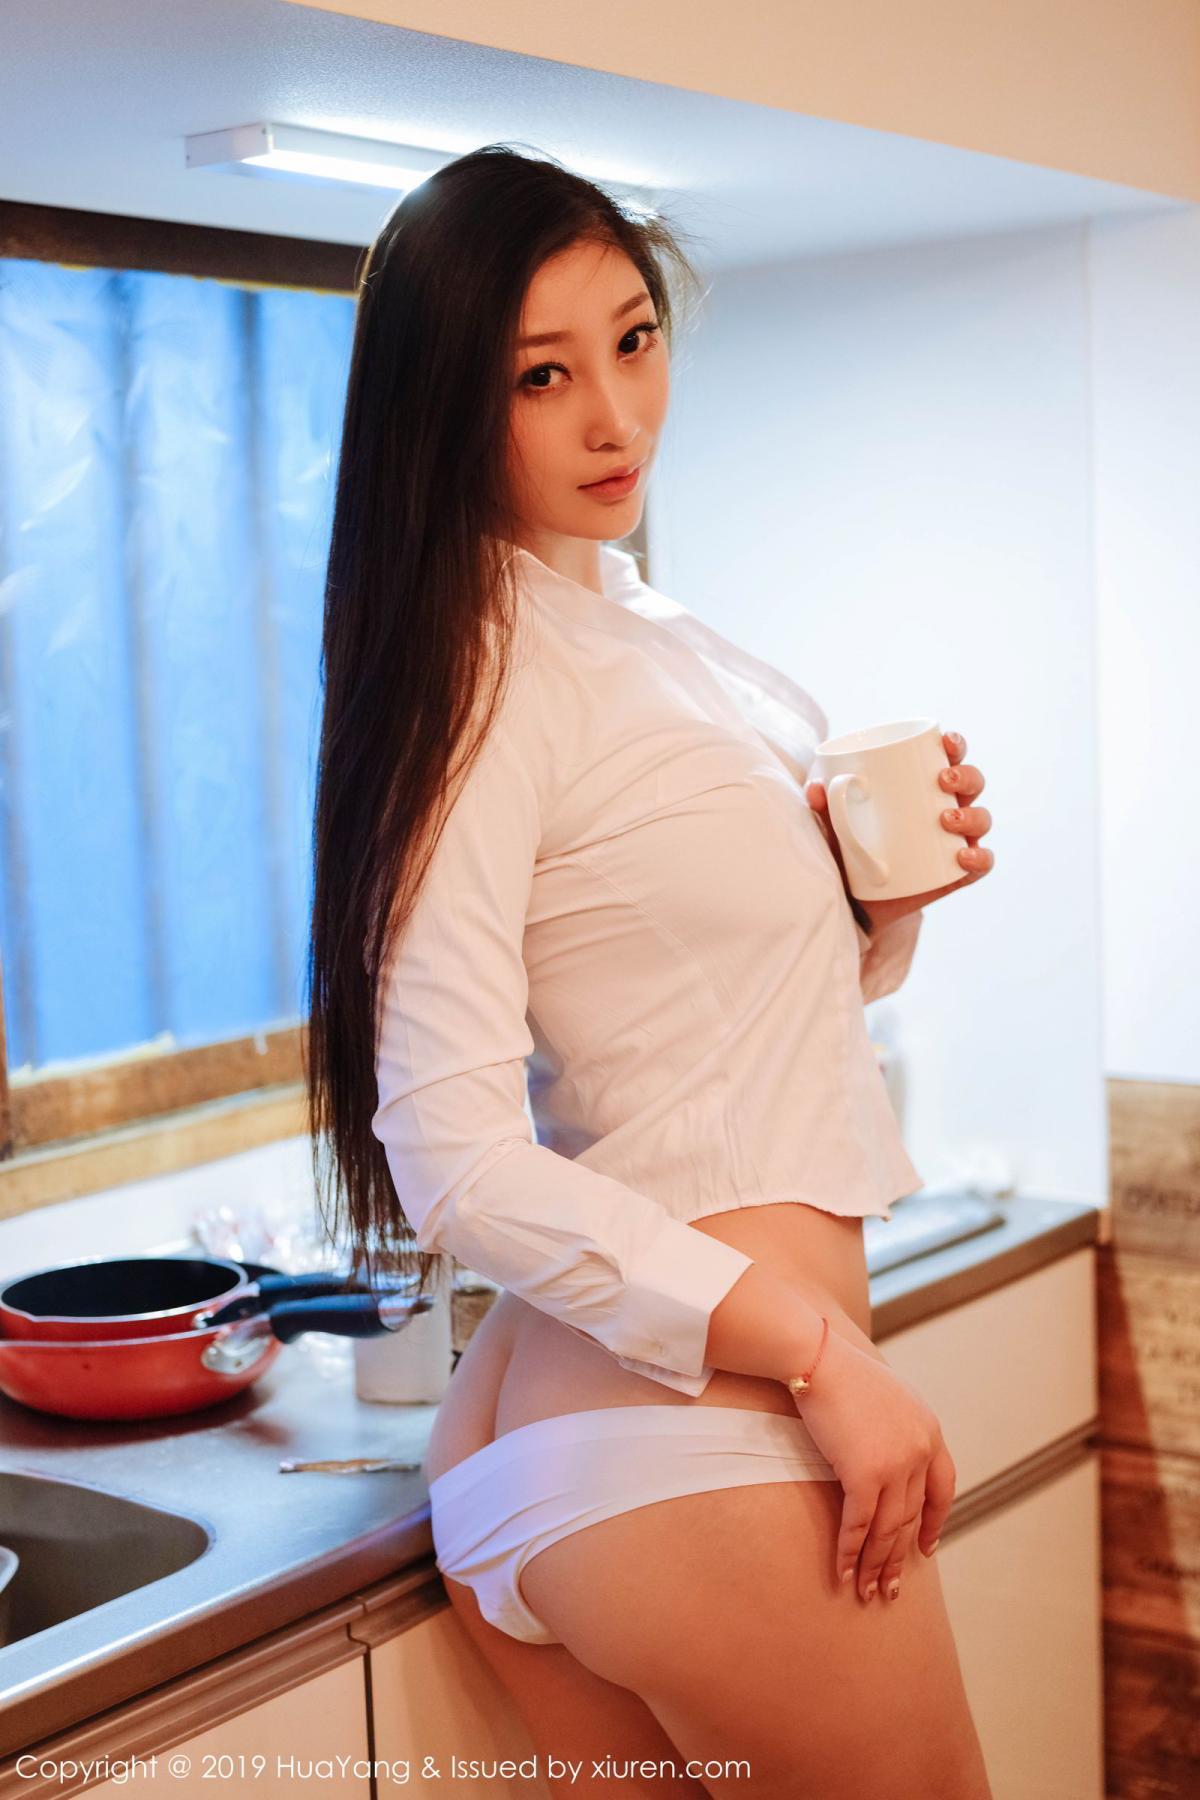 [Huayang] Vol.125 lemon 38P, Da Ji Toxic, HuaYang